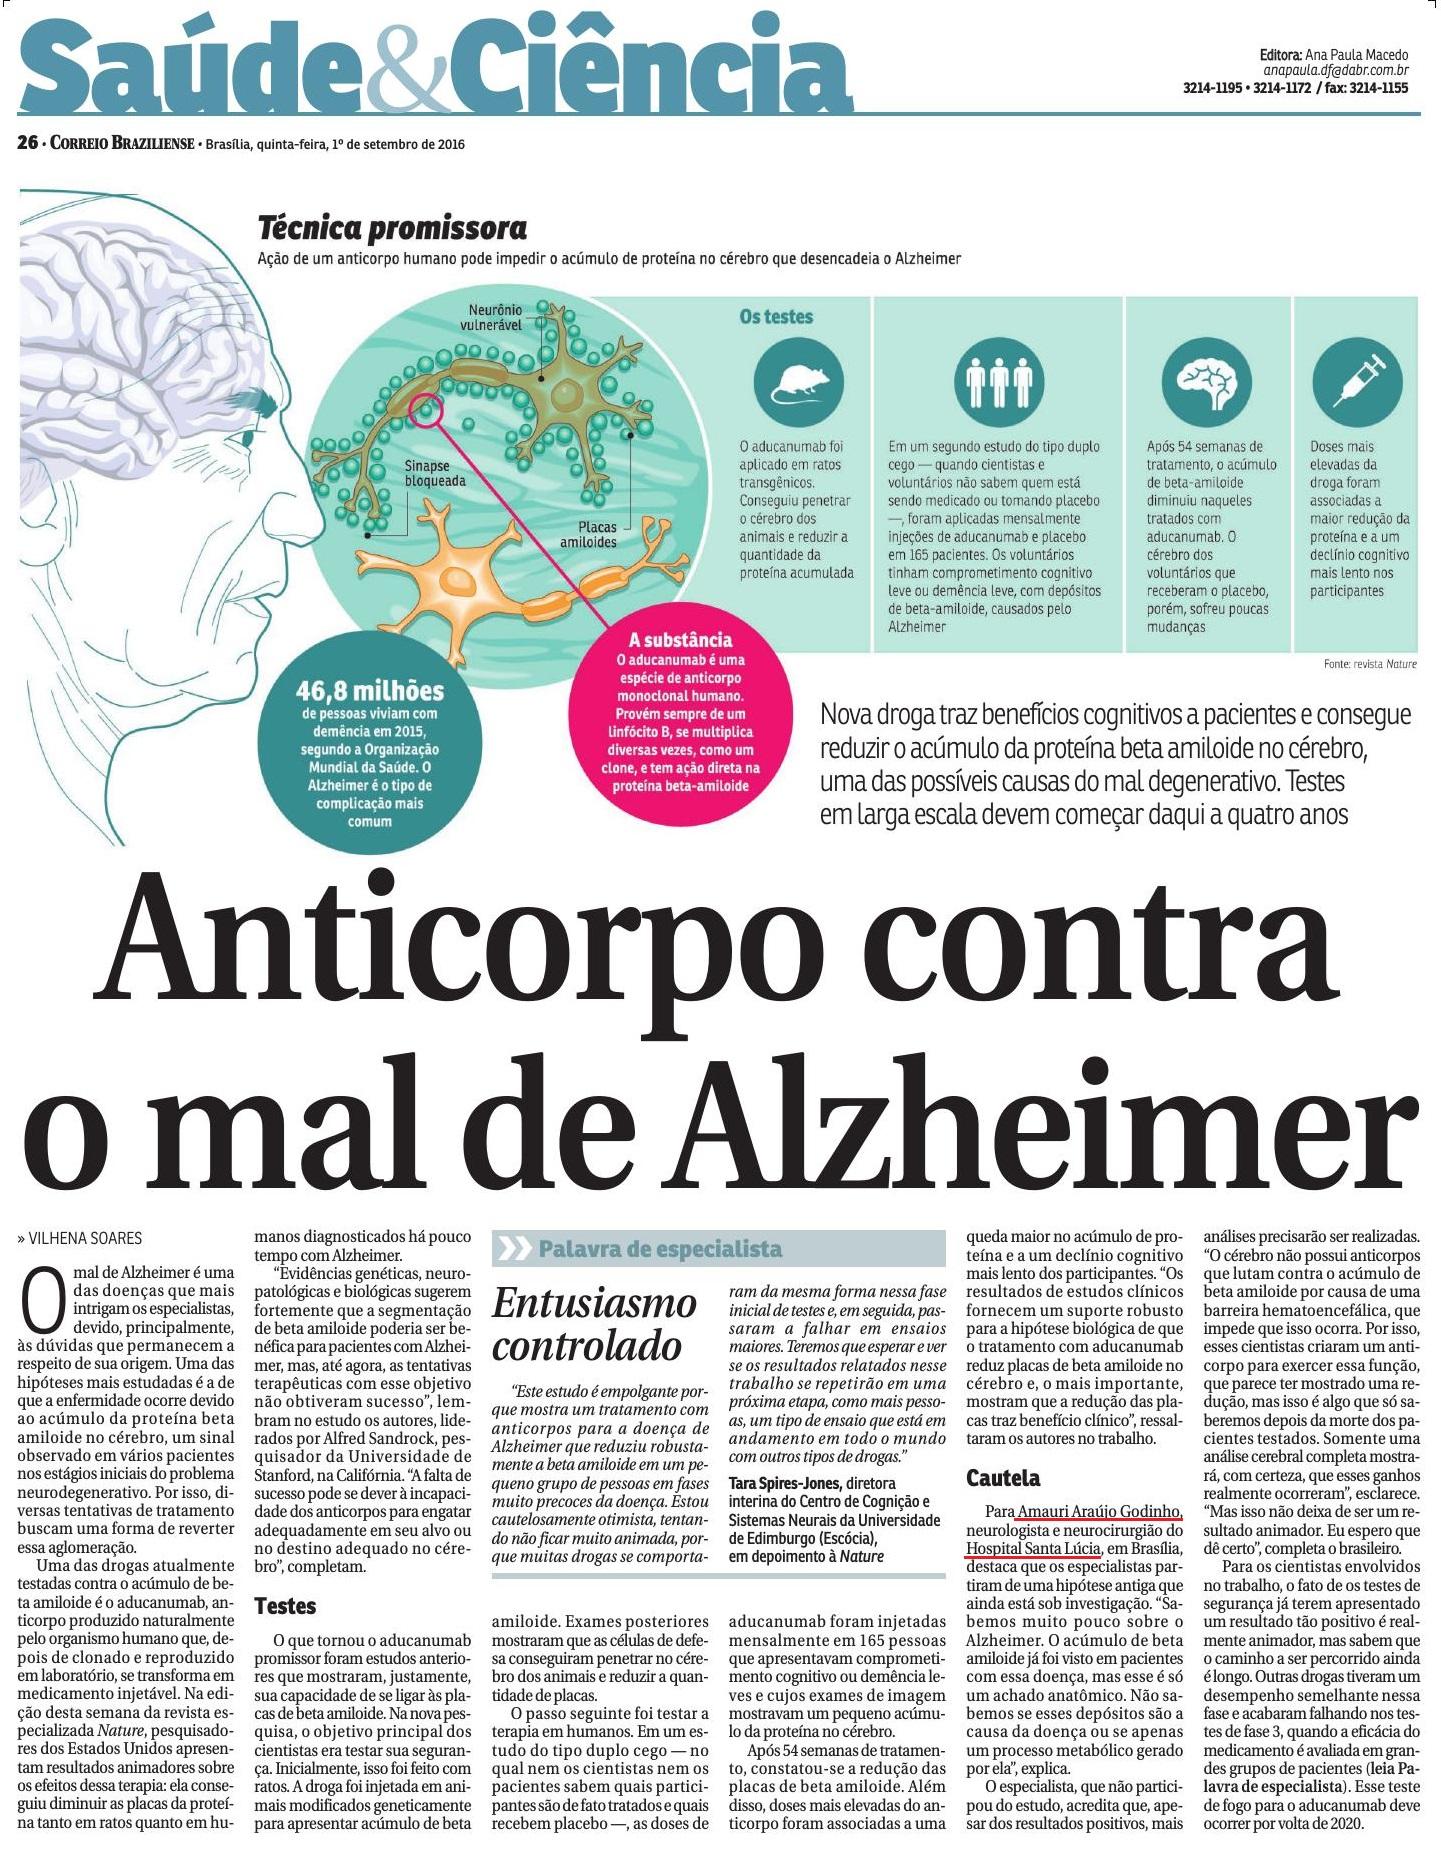 Correio Braziliense - Dr. Amauri Godinho HSL - 01-09-20166